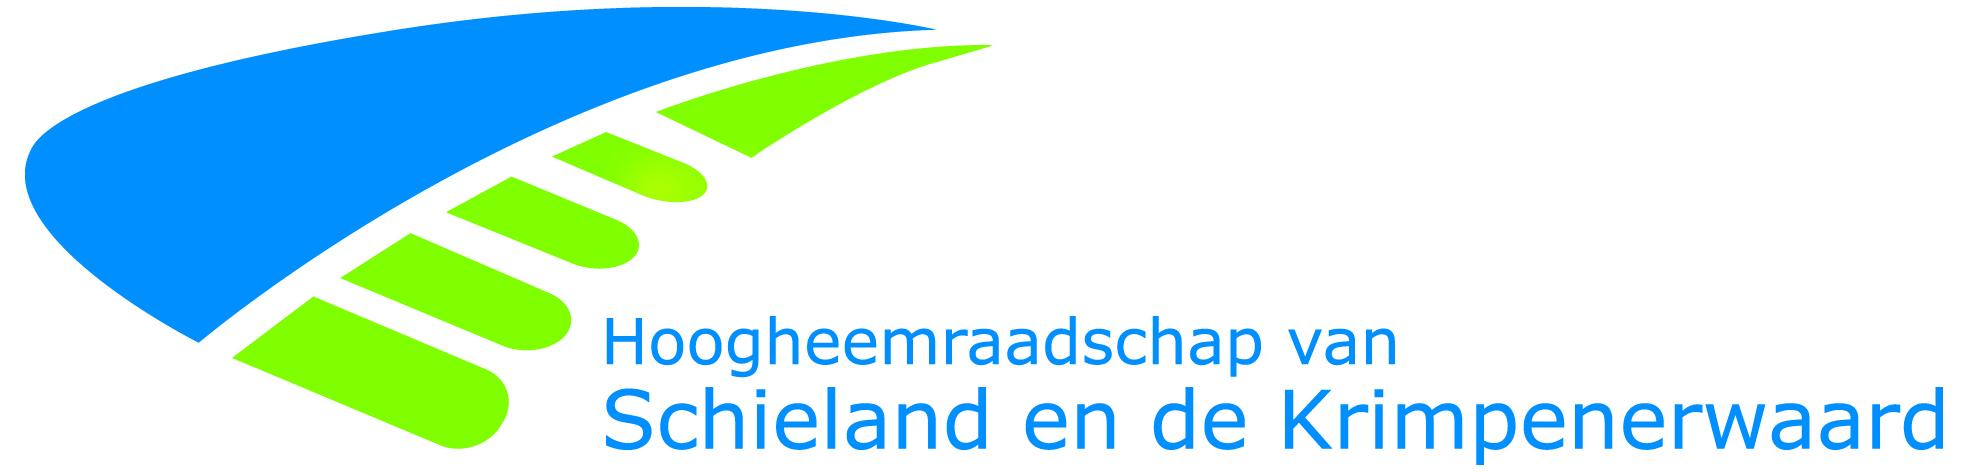 Logo HHSK